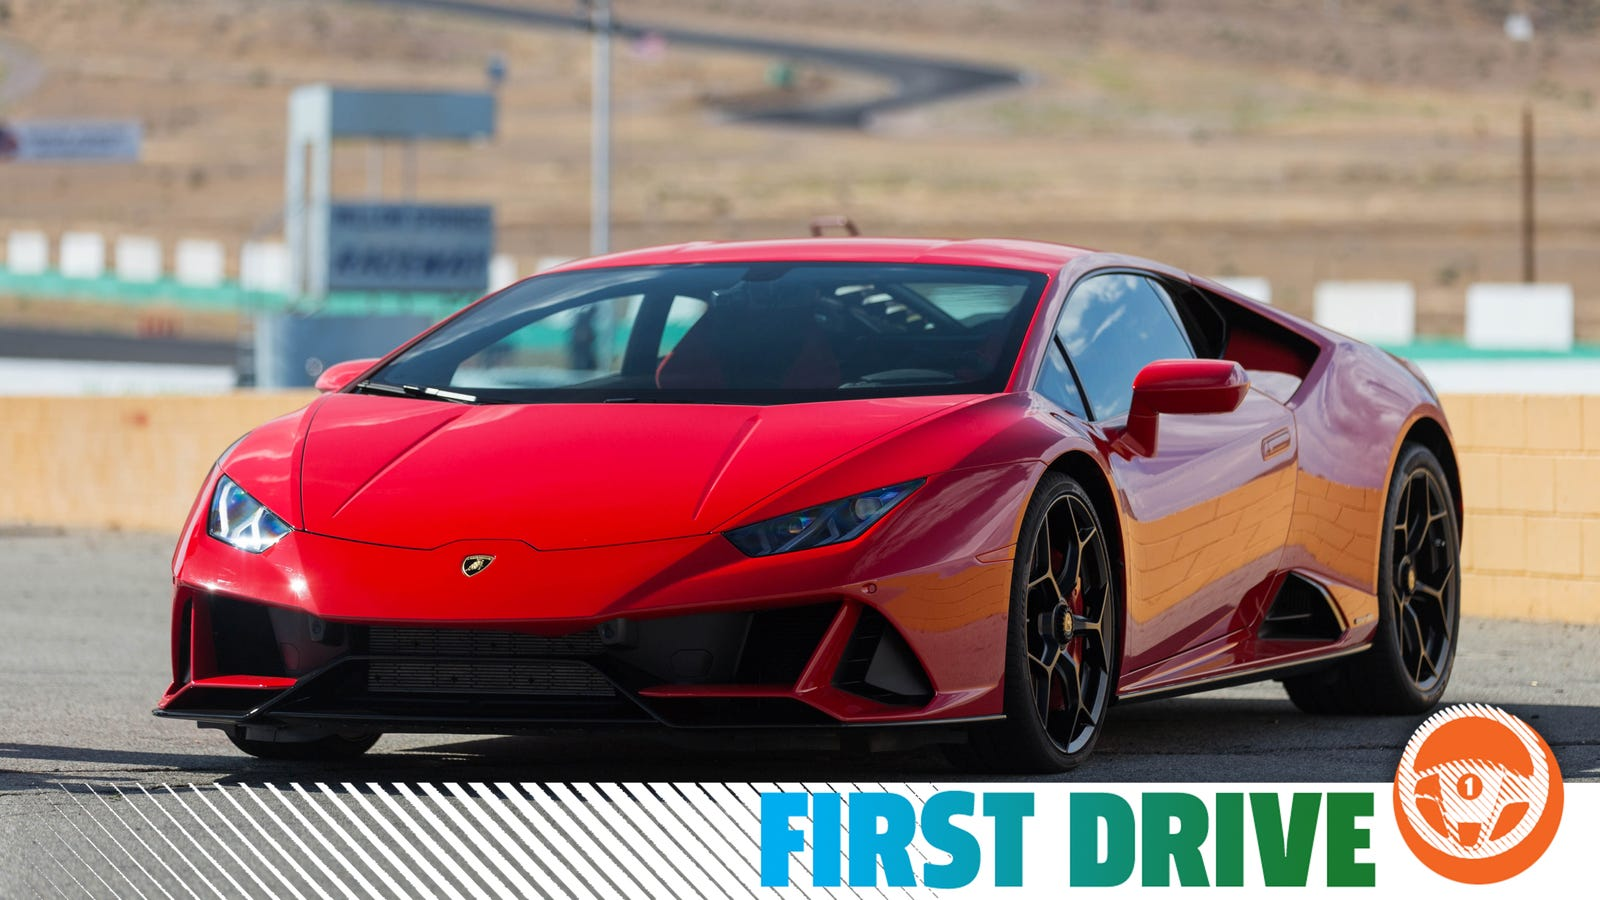 2020 Lamborghini Huracán Evo: Bow Down to Your V10 Lord of Natural Aspiration